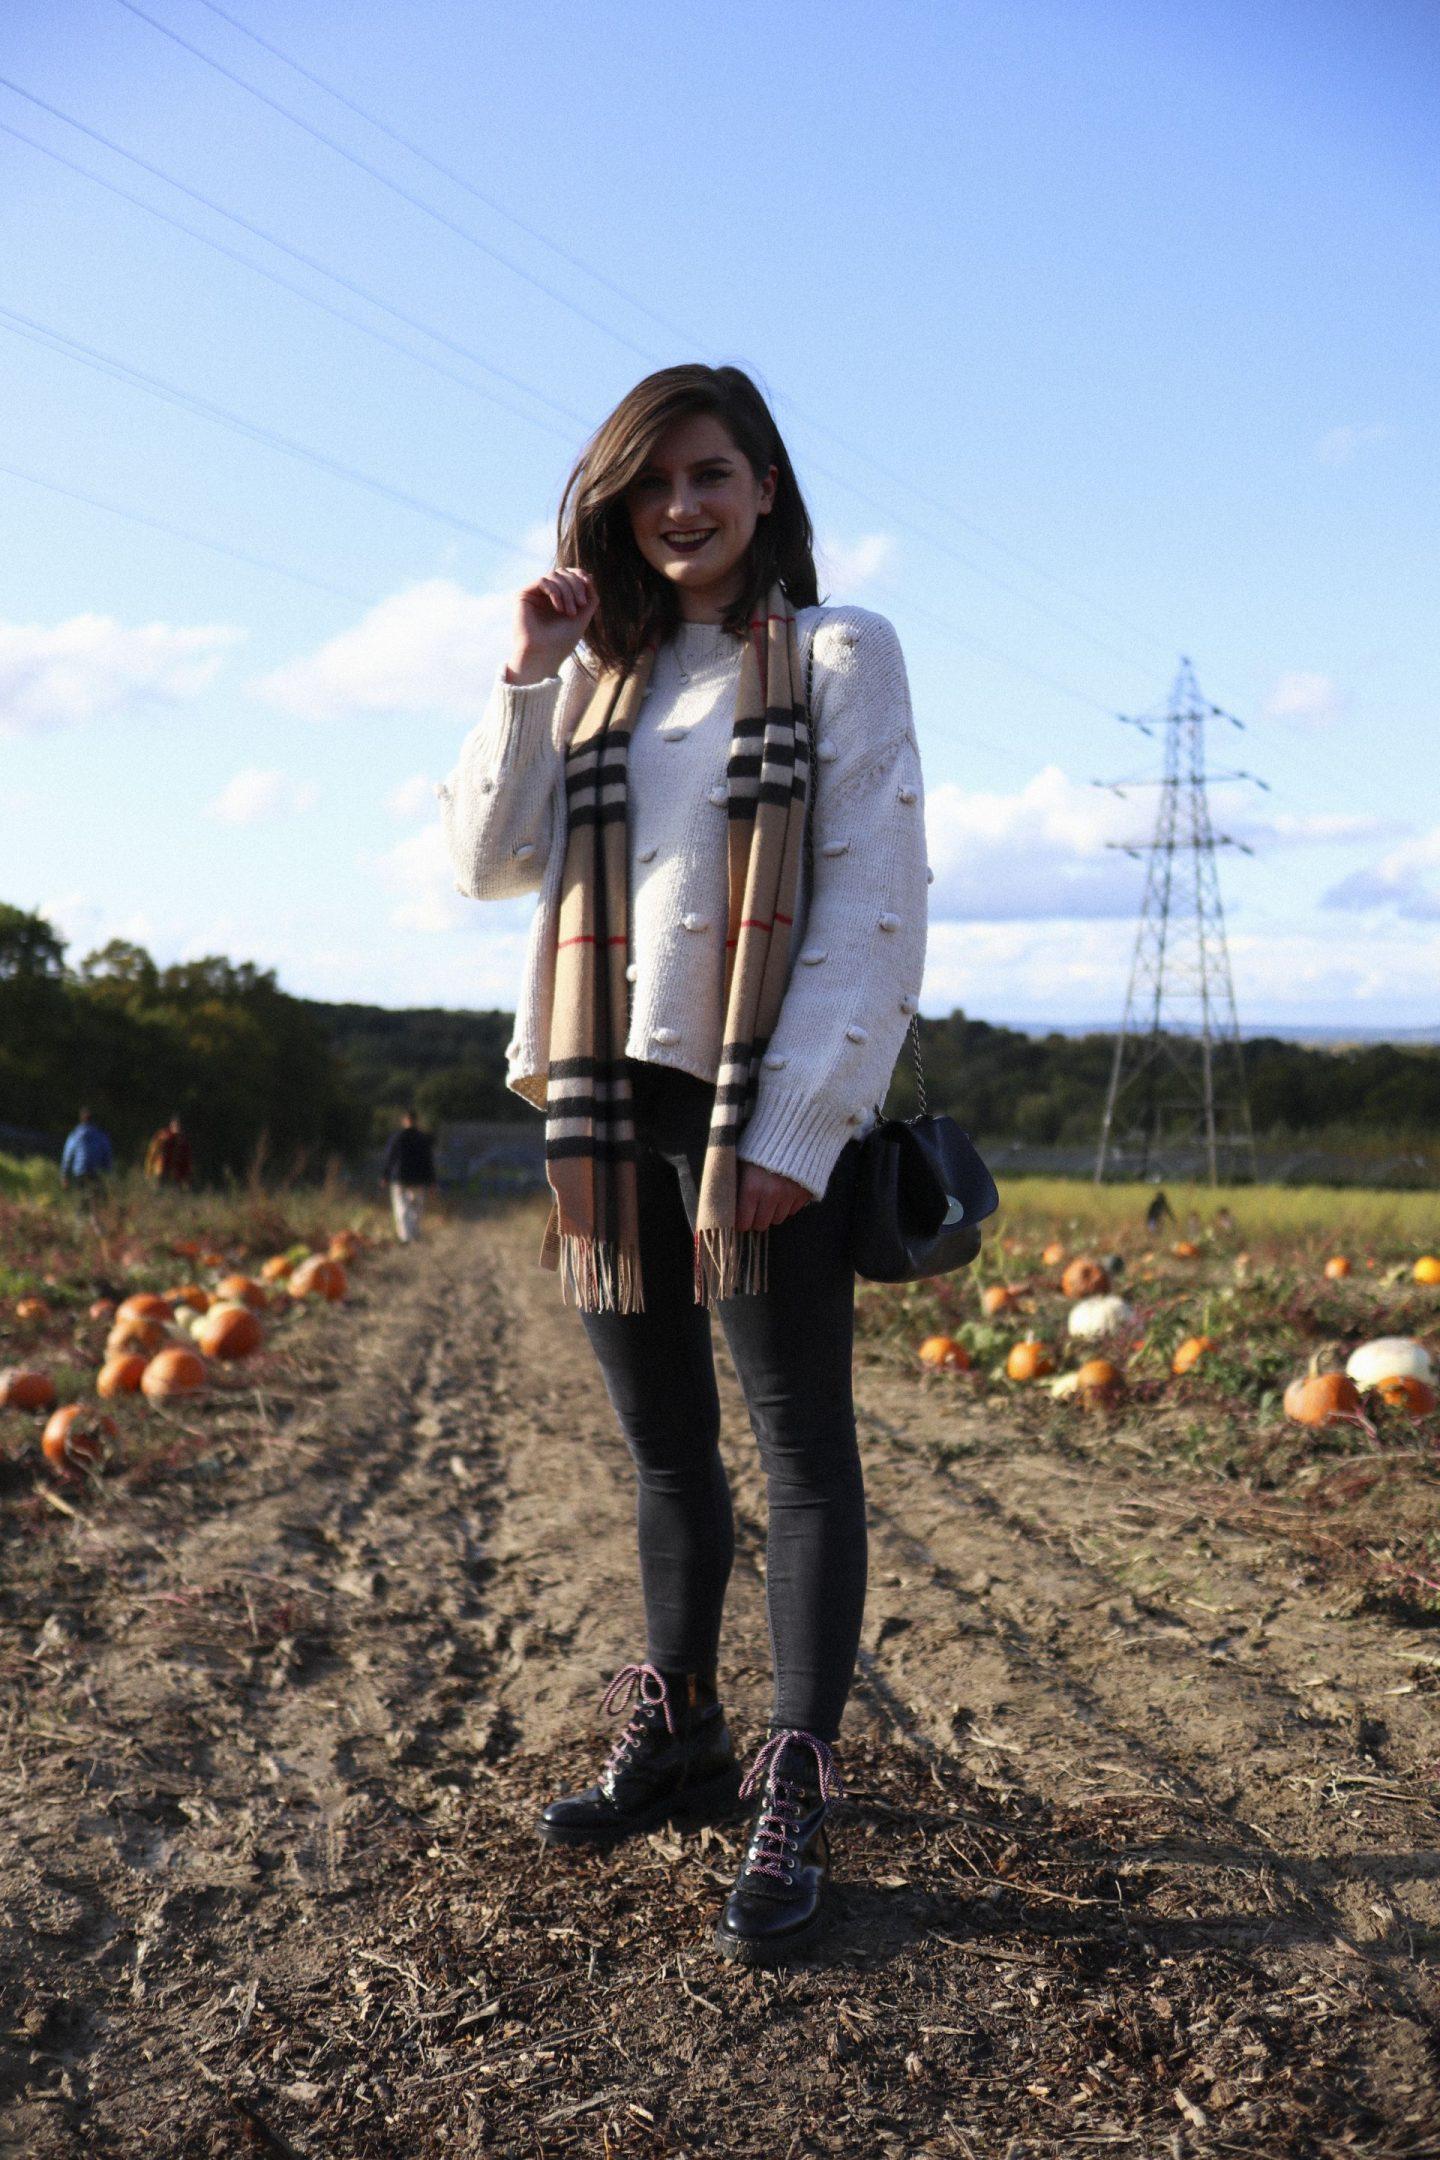 girl standing in pumpkin patch